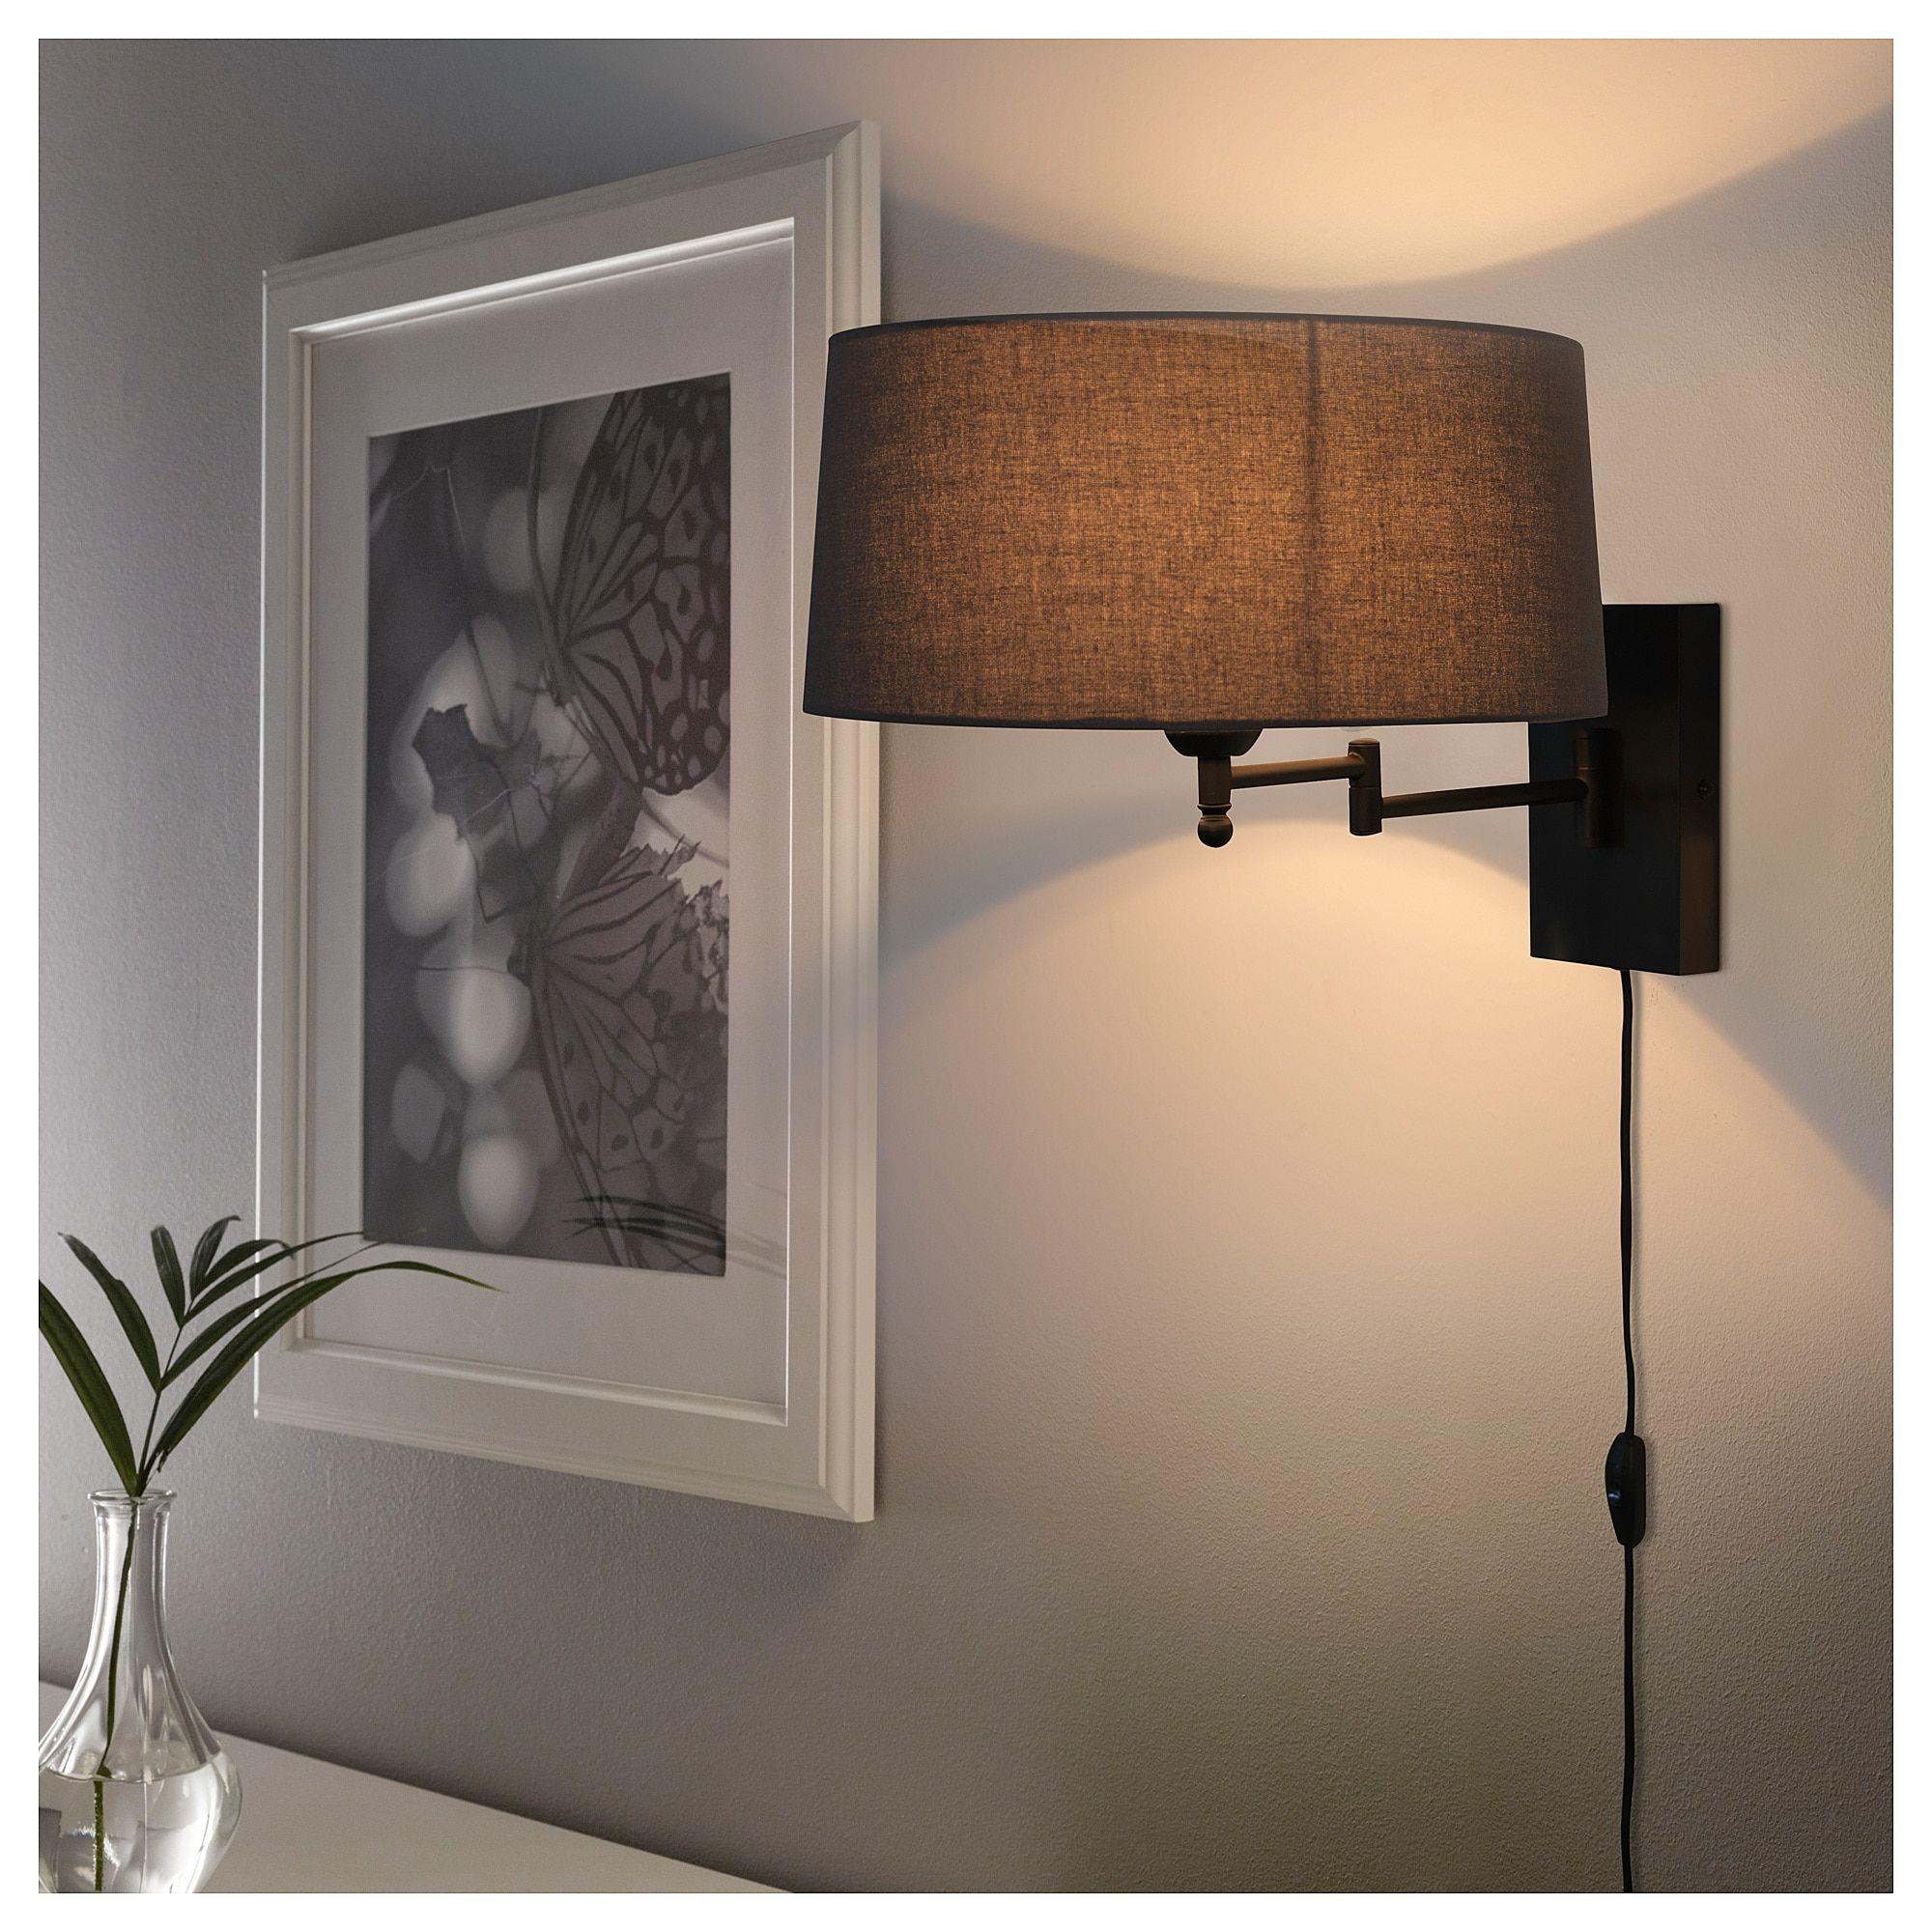 Halkip Wall Lamp With Swing Arm Gray Ikea Wall Lamps Bedroom Wall Lights Bedroom Wall Mounted Lights Bedroom